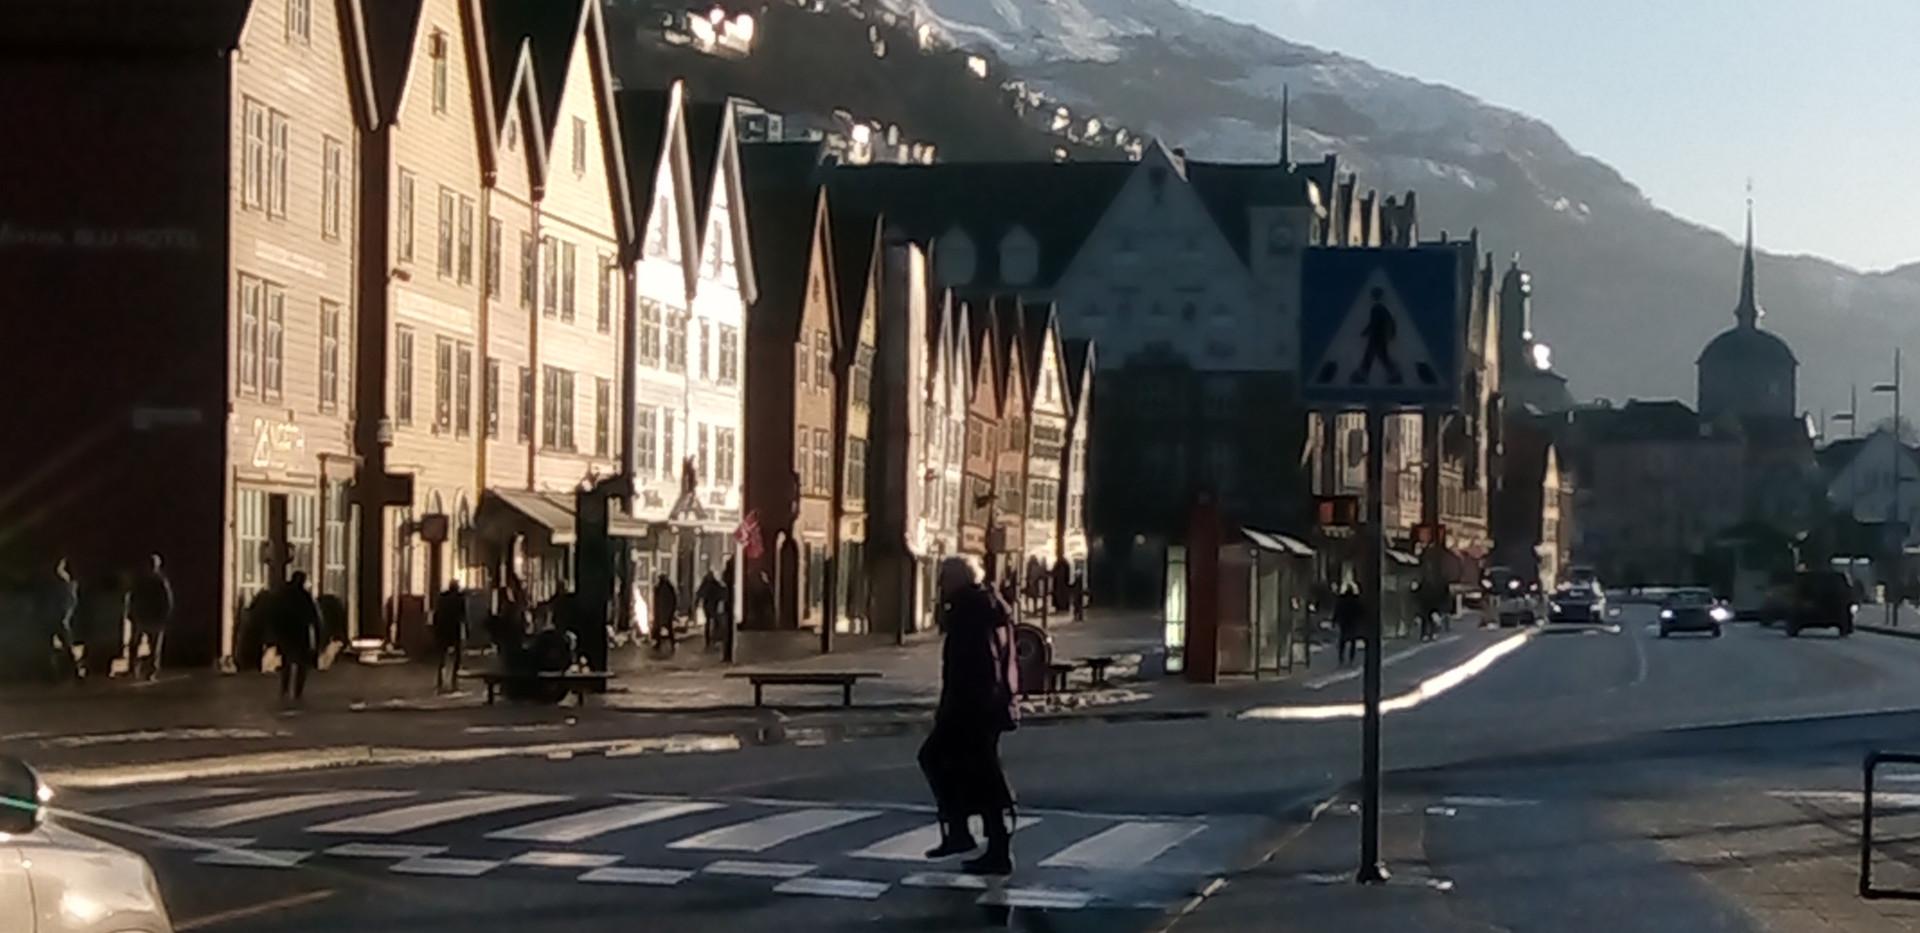 Brygenn Old Town